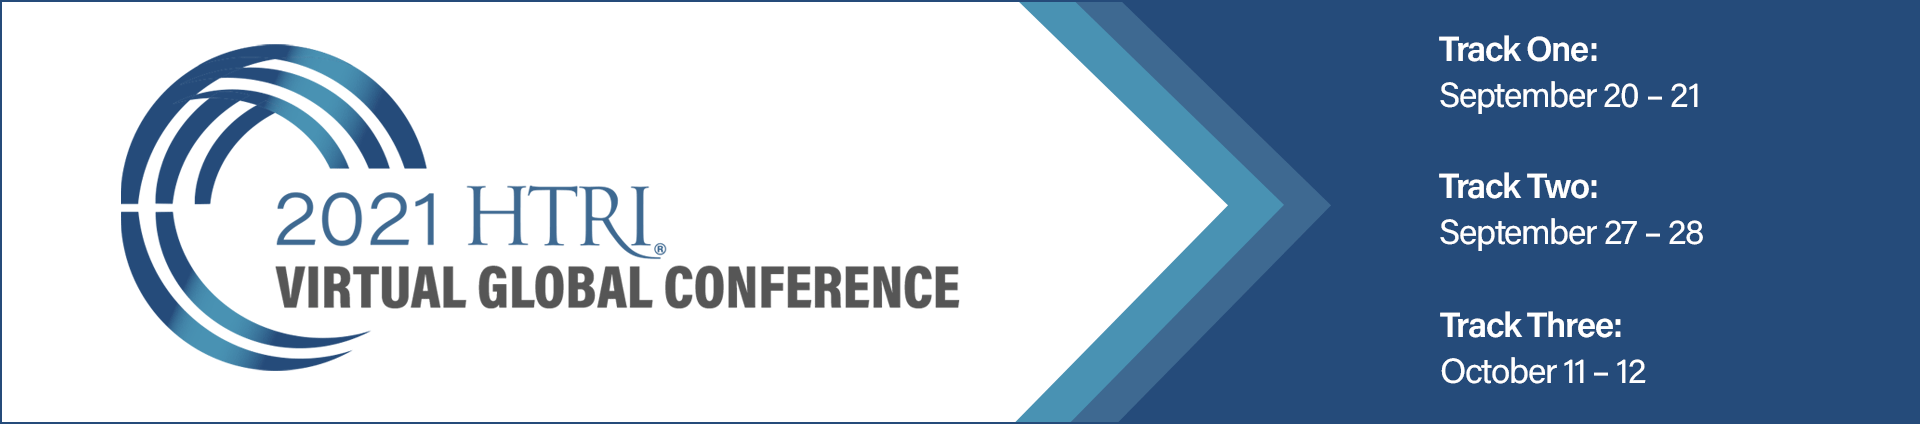 Global Conference 2021 Hero Image